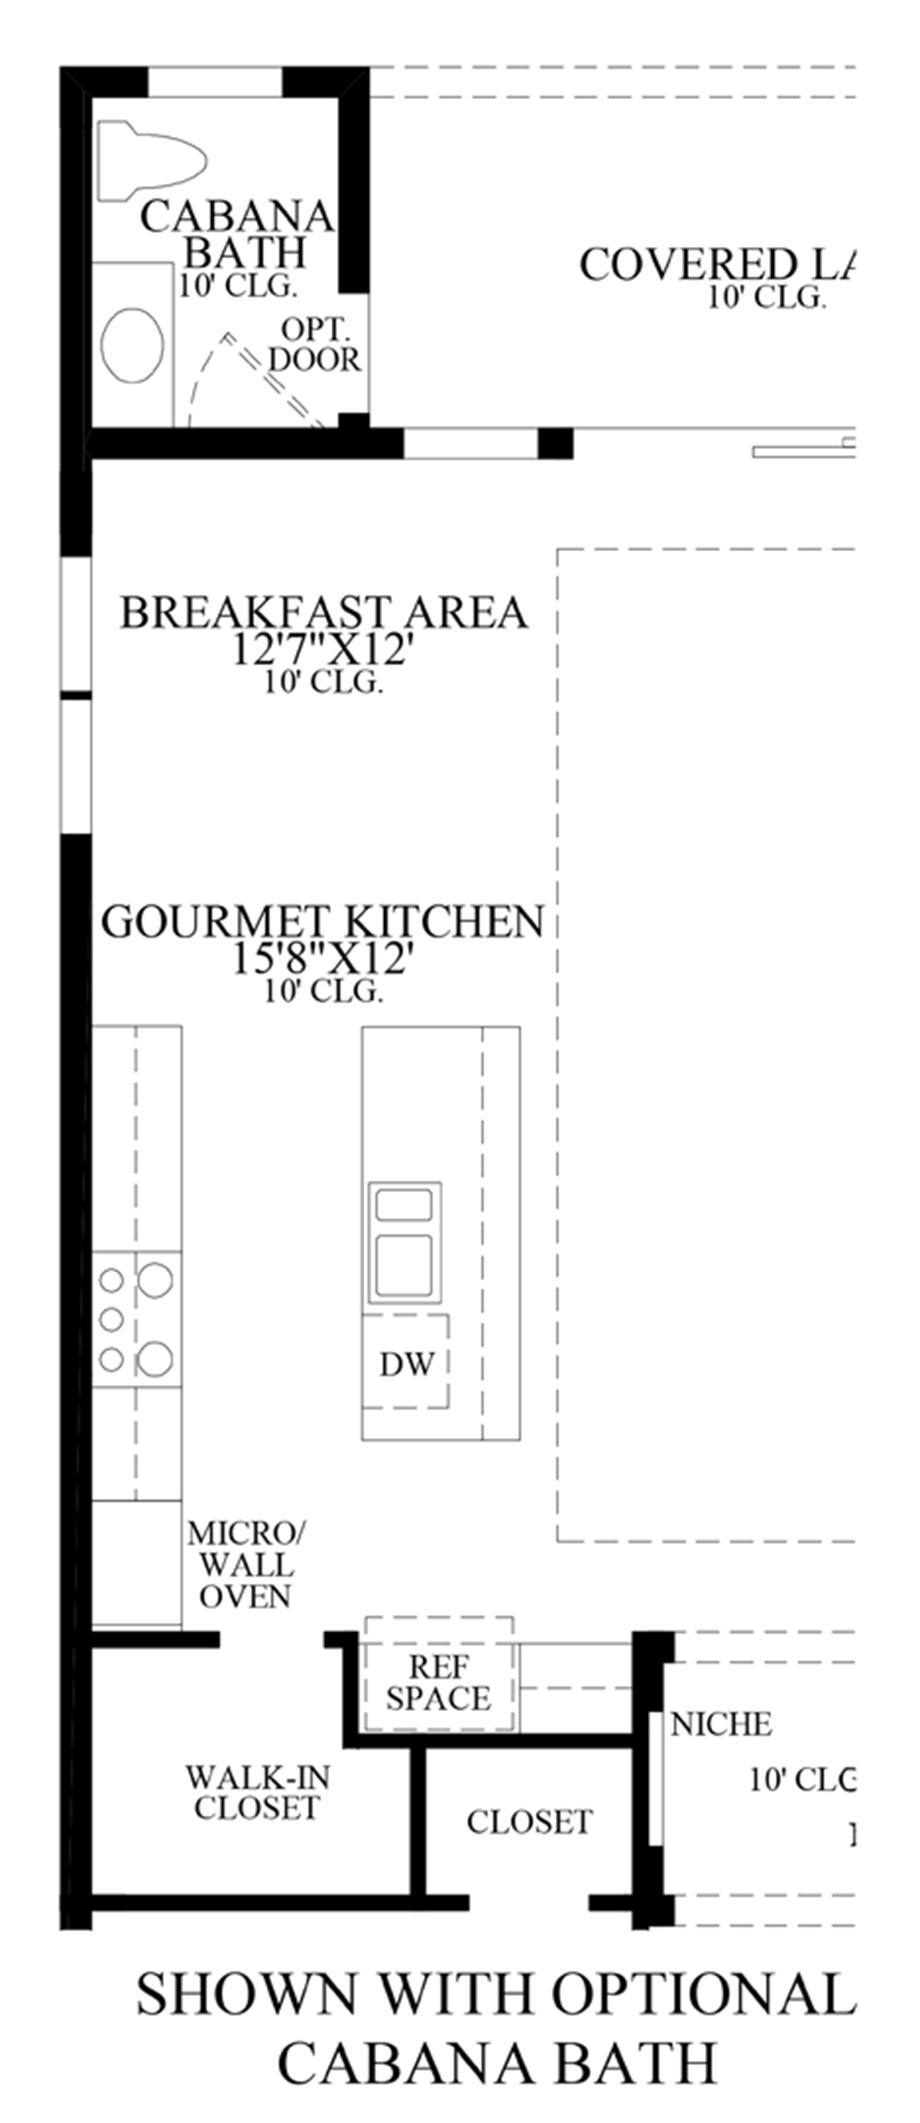 Optional Cabana Bath Floor Plan